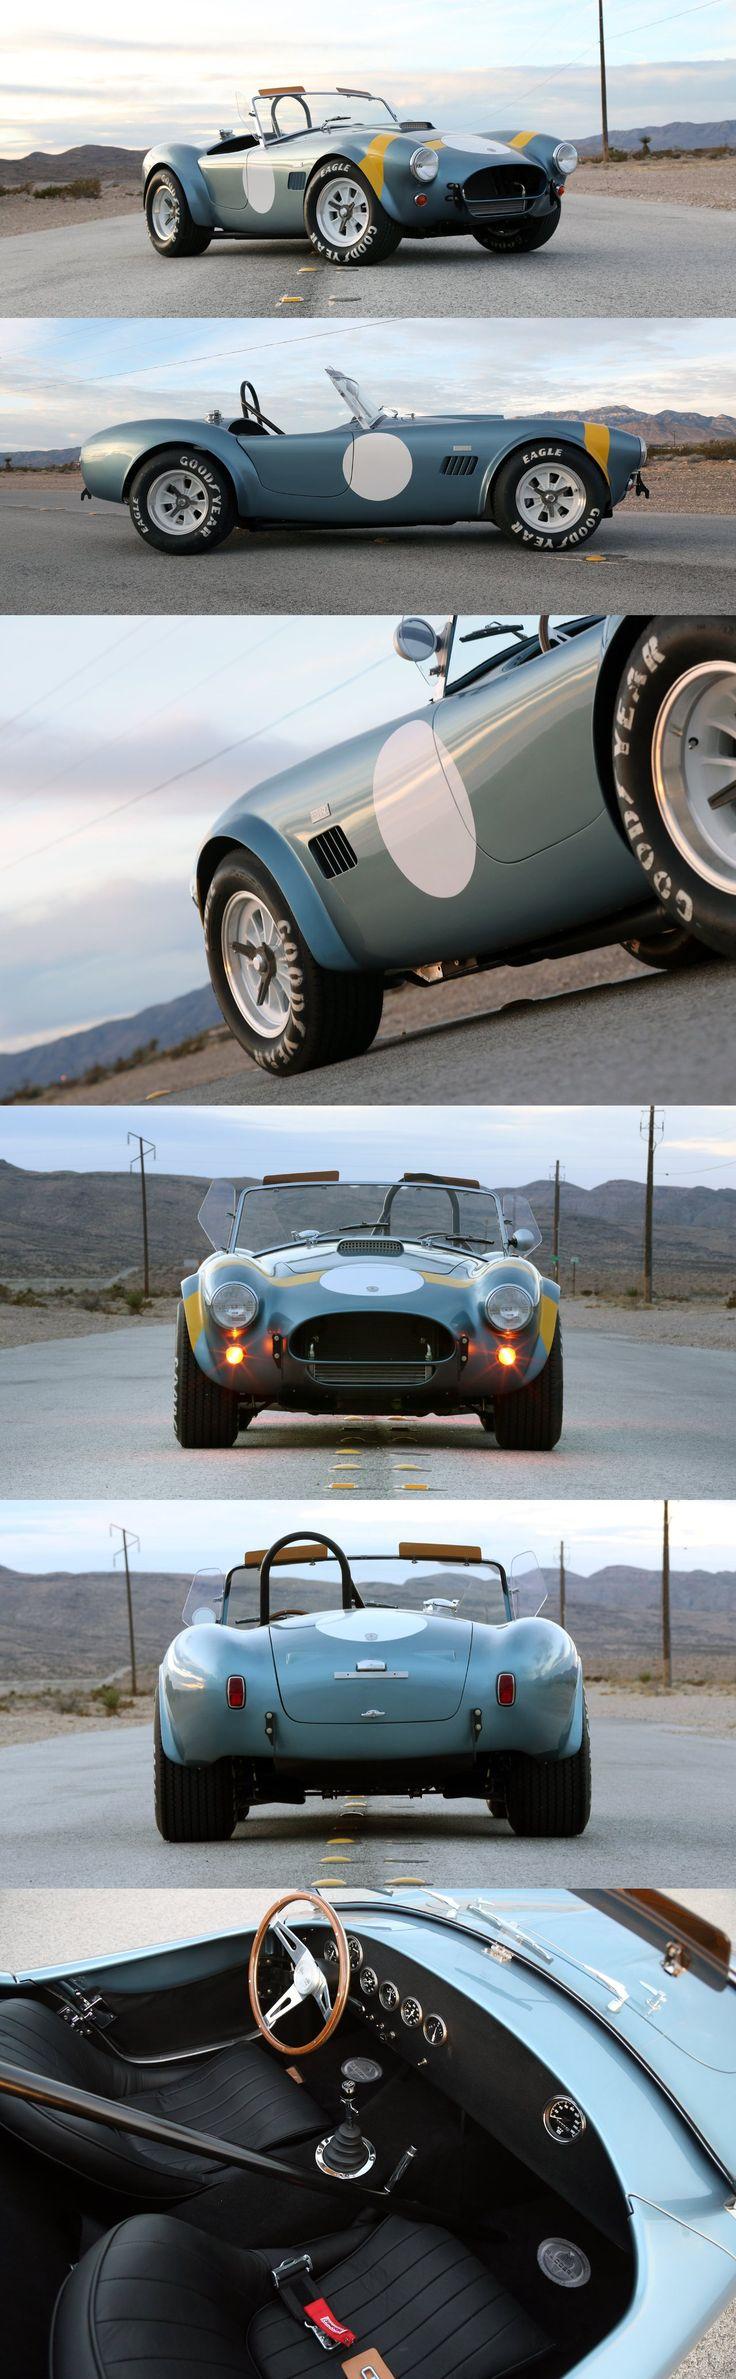 50th Anniversary CSX7000 FIA Continuation Cobra by Shelby American Inc.